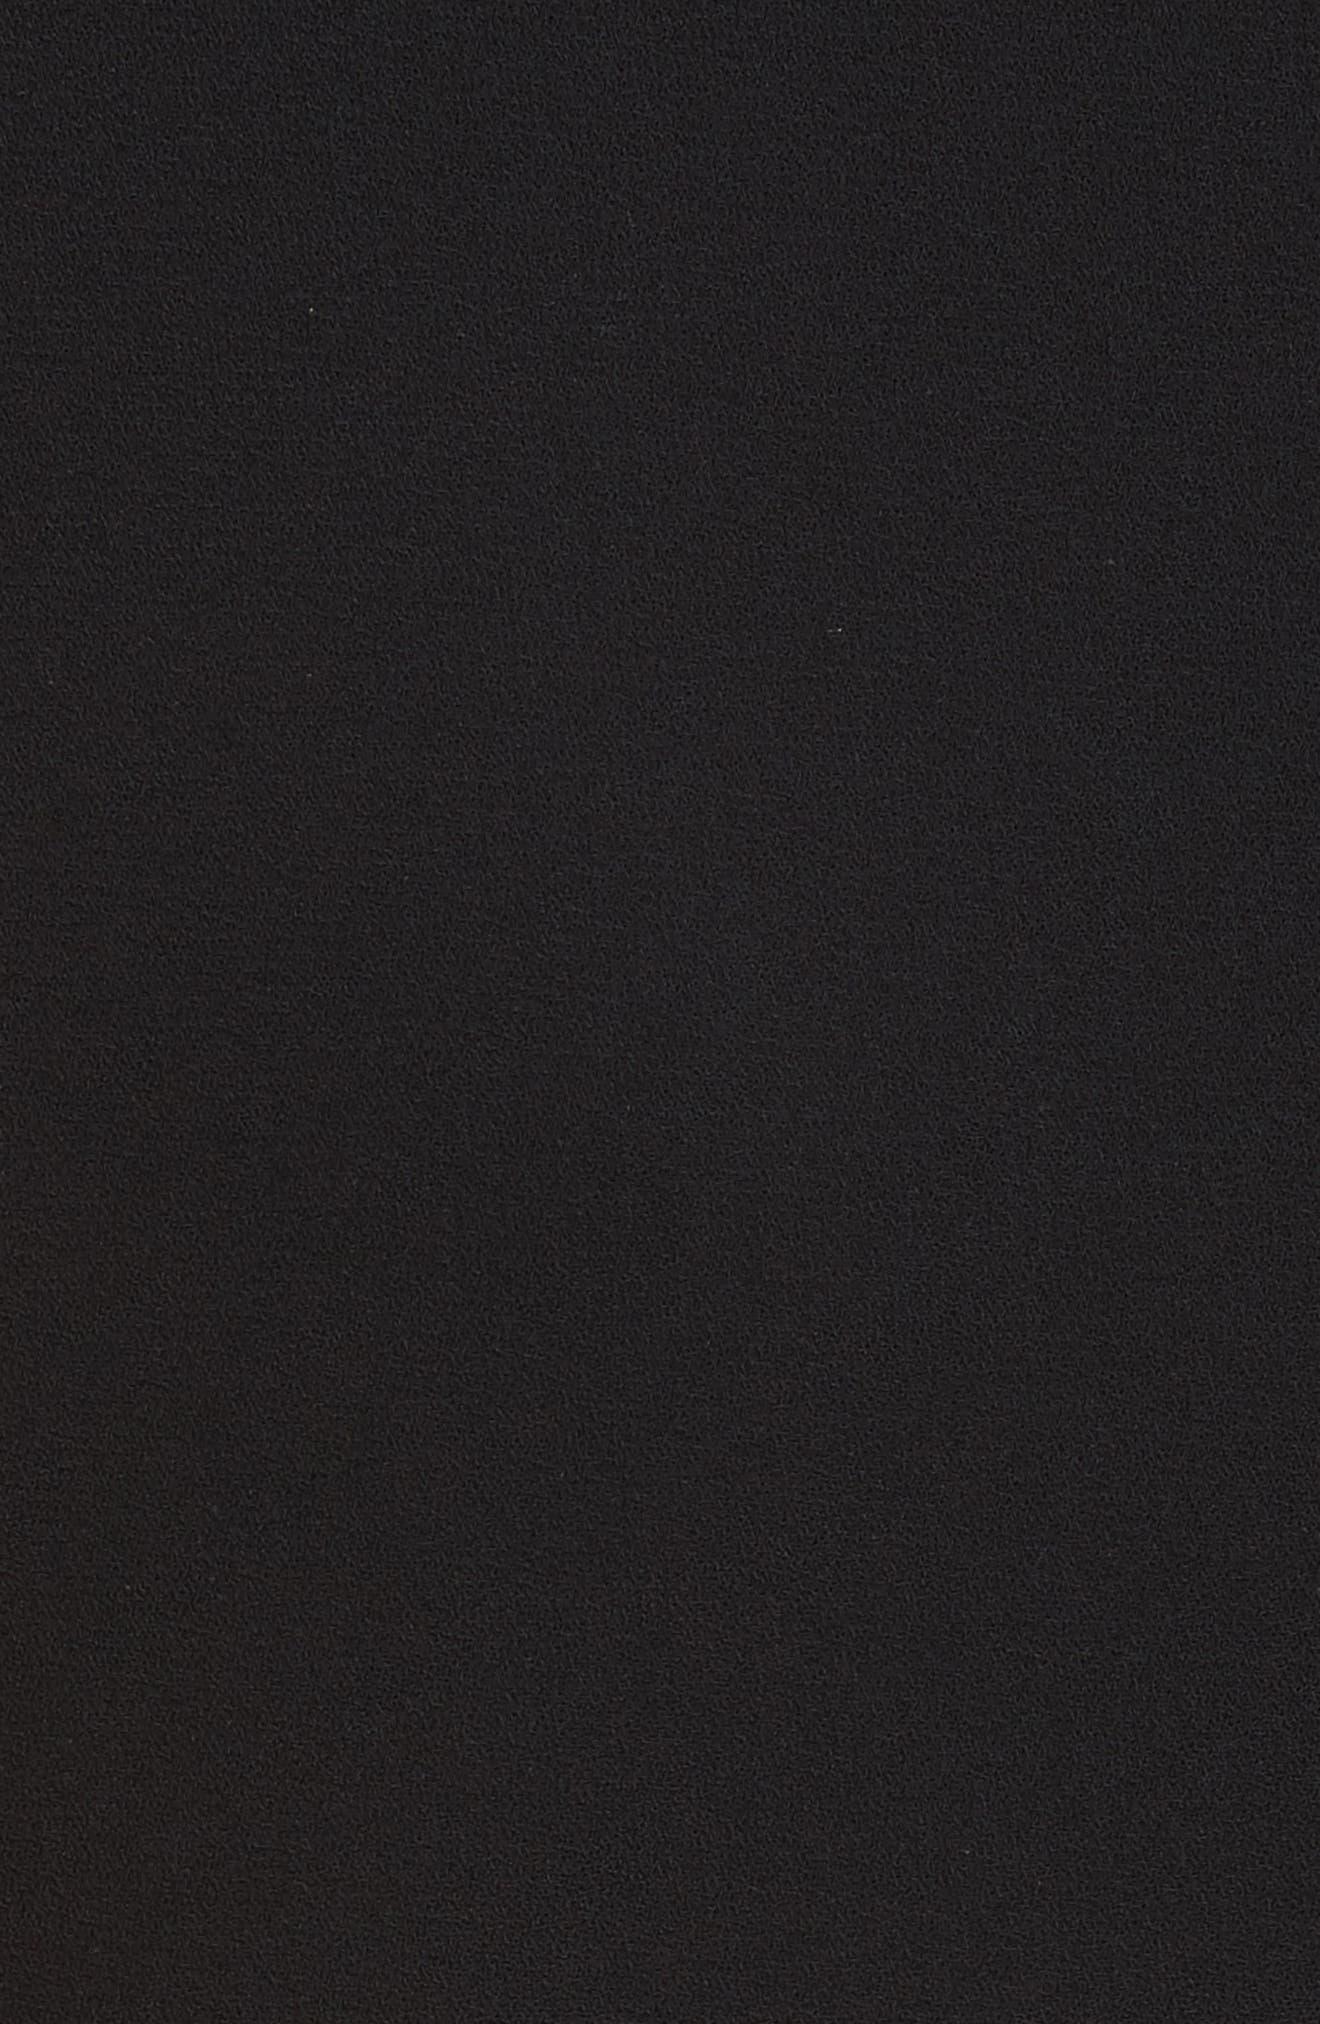 Julieta Inverted Pleat Fit & Flare Dress,                             Alternate thumbnail 5, color,                             Black